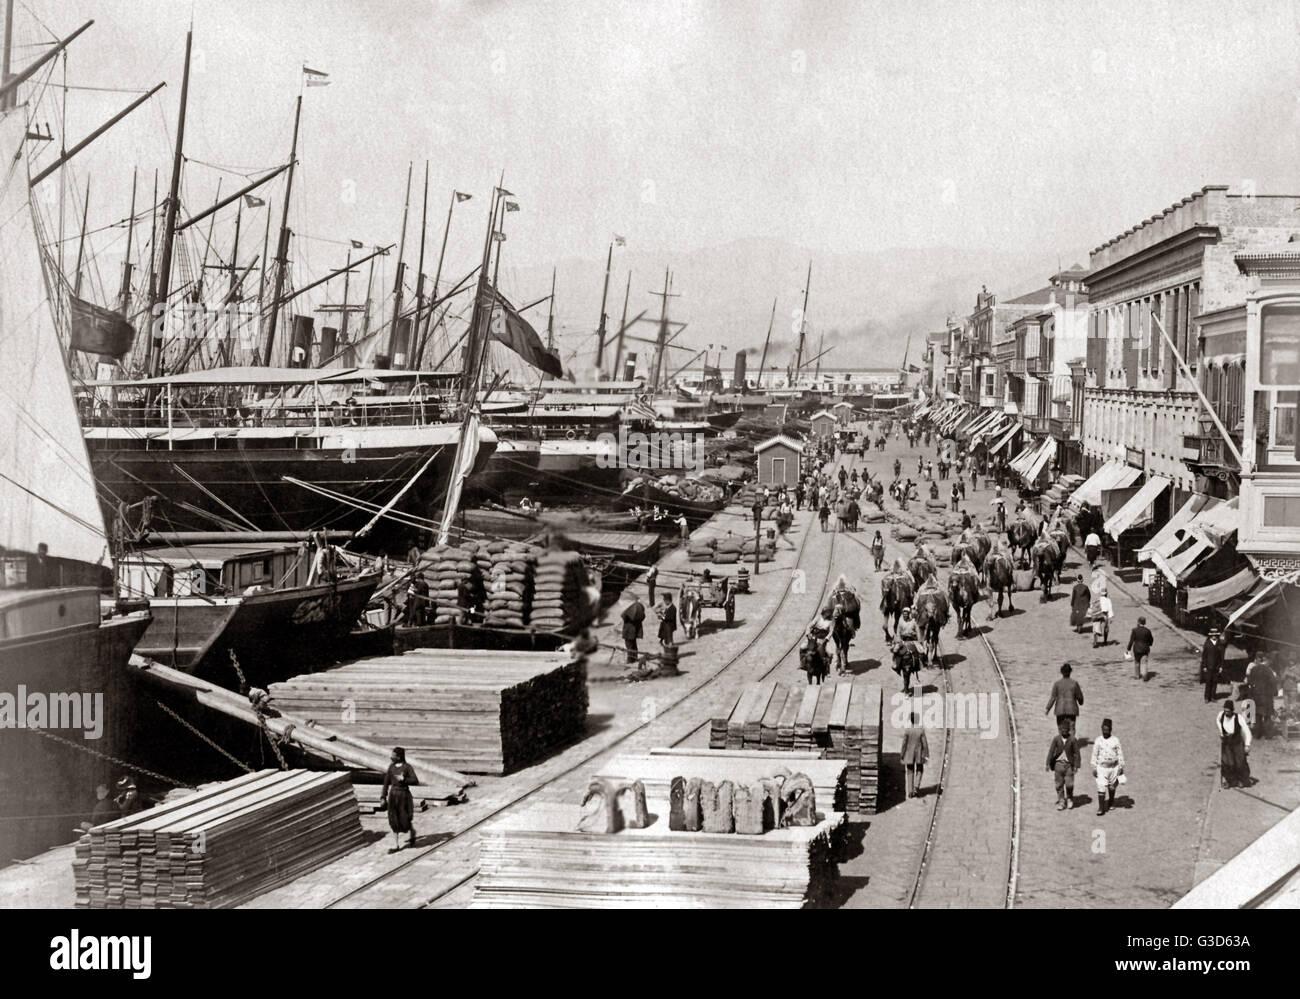 Shipping wharves, probably Port Said, Egypt, circa 1890.     Date: circa 1890 Stock Photo